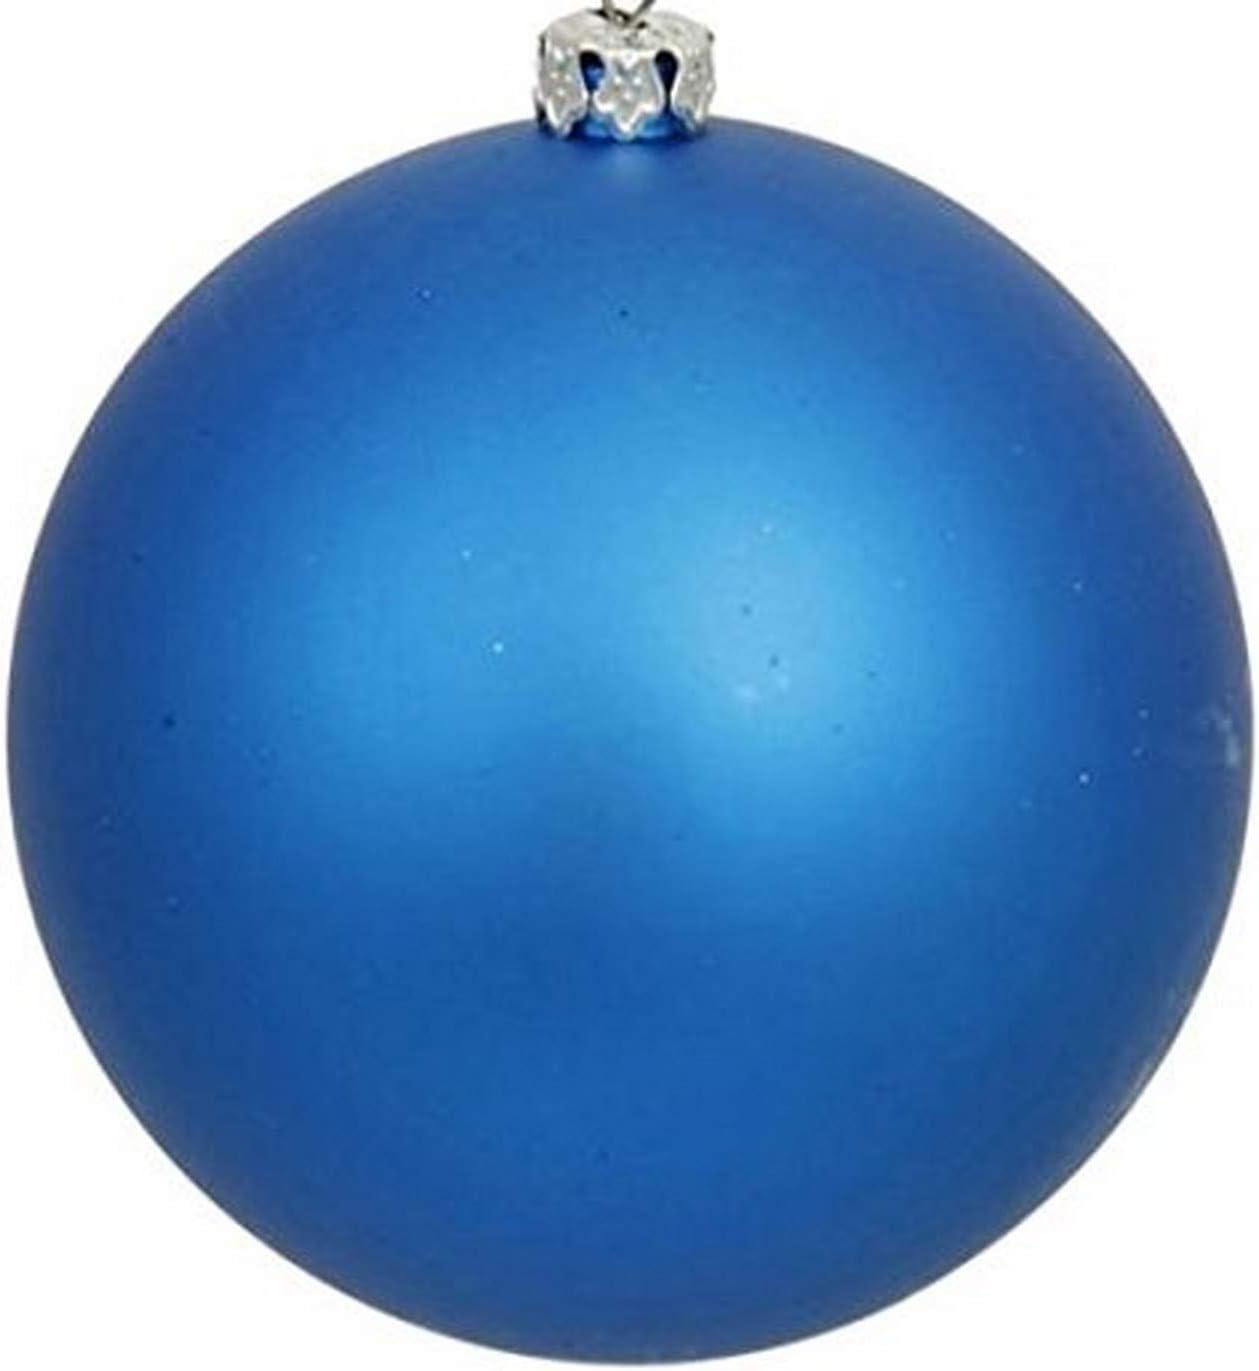 2.5 Vickerman 31453943 60 Count Matte Teal Shatterproof Christmas Ball Ornaments Green